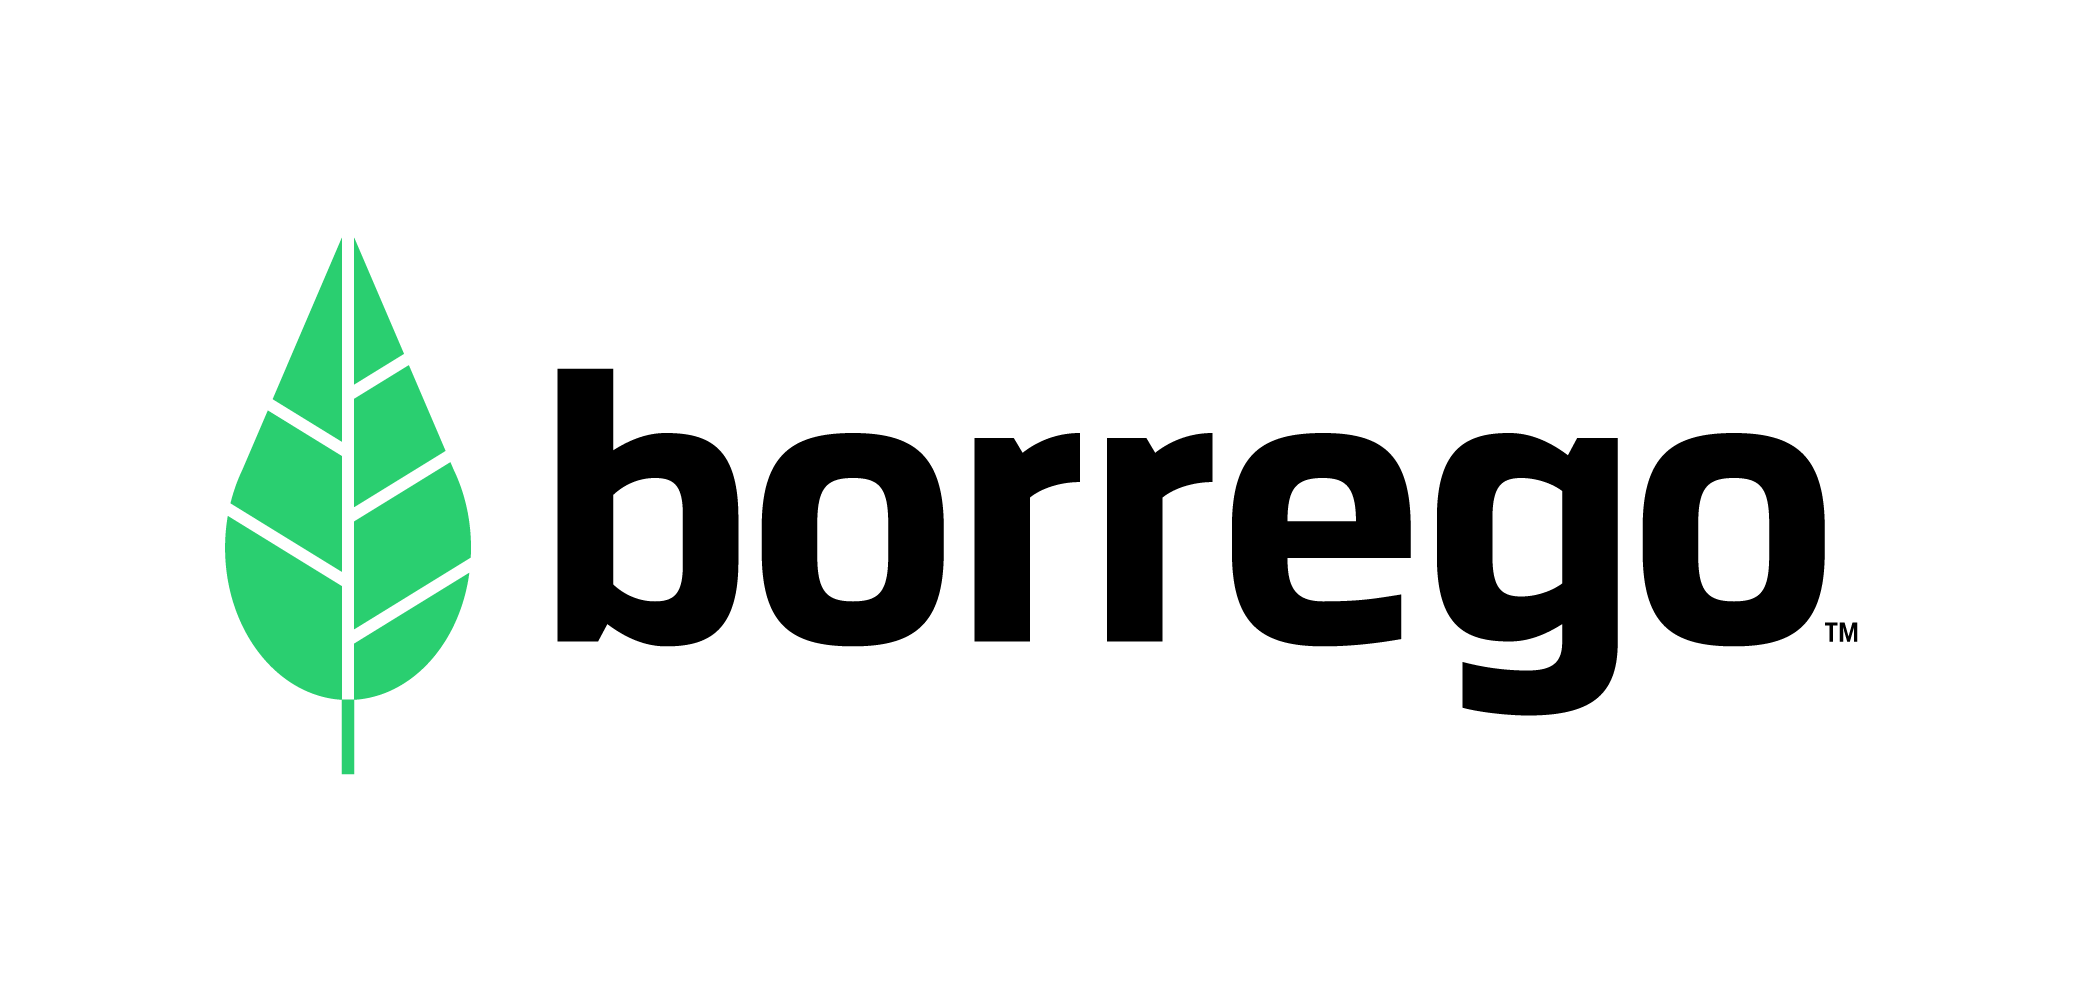 Borrego_logo-green_black_TM_logo